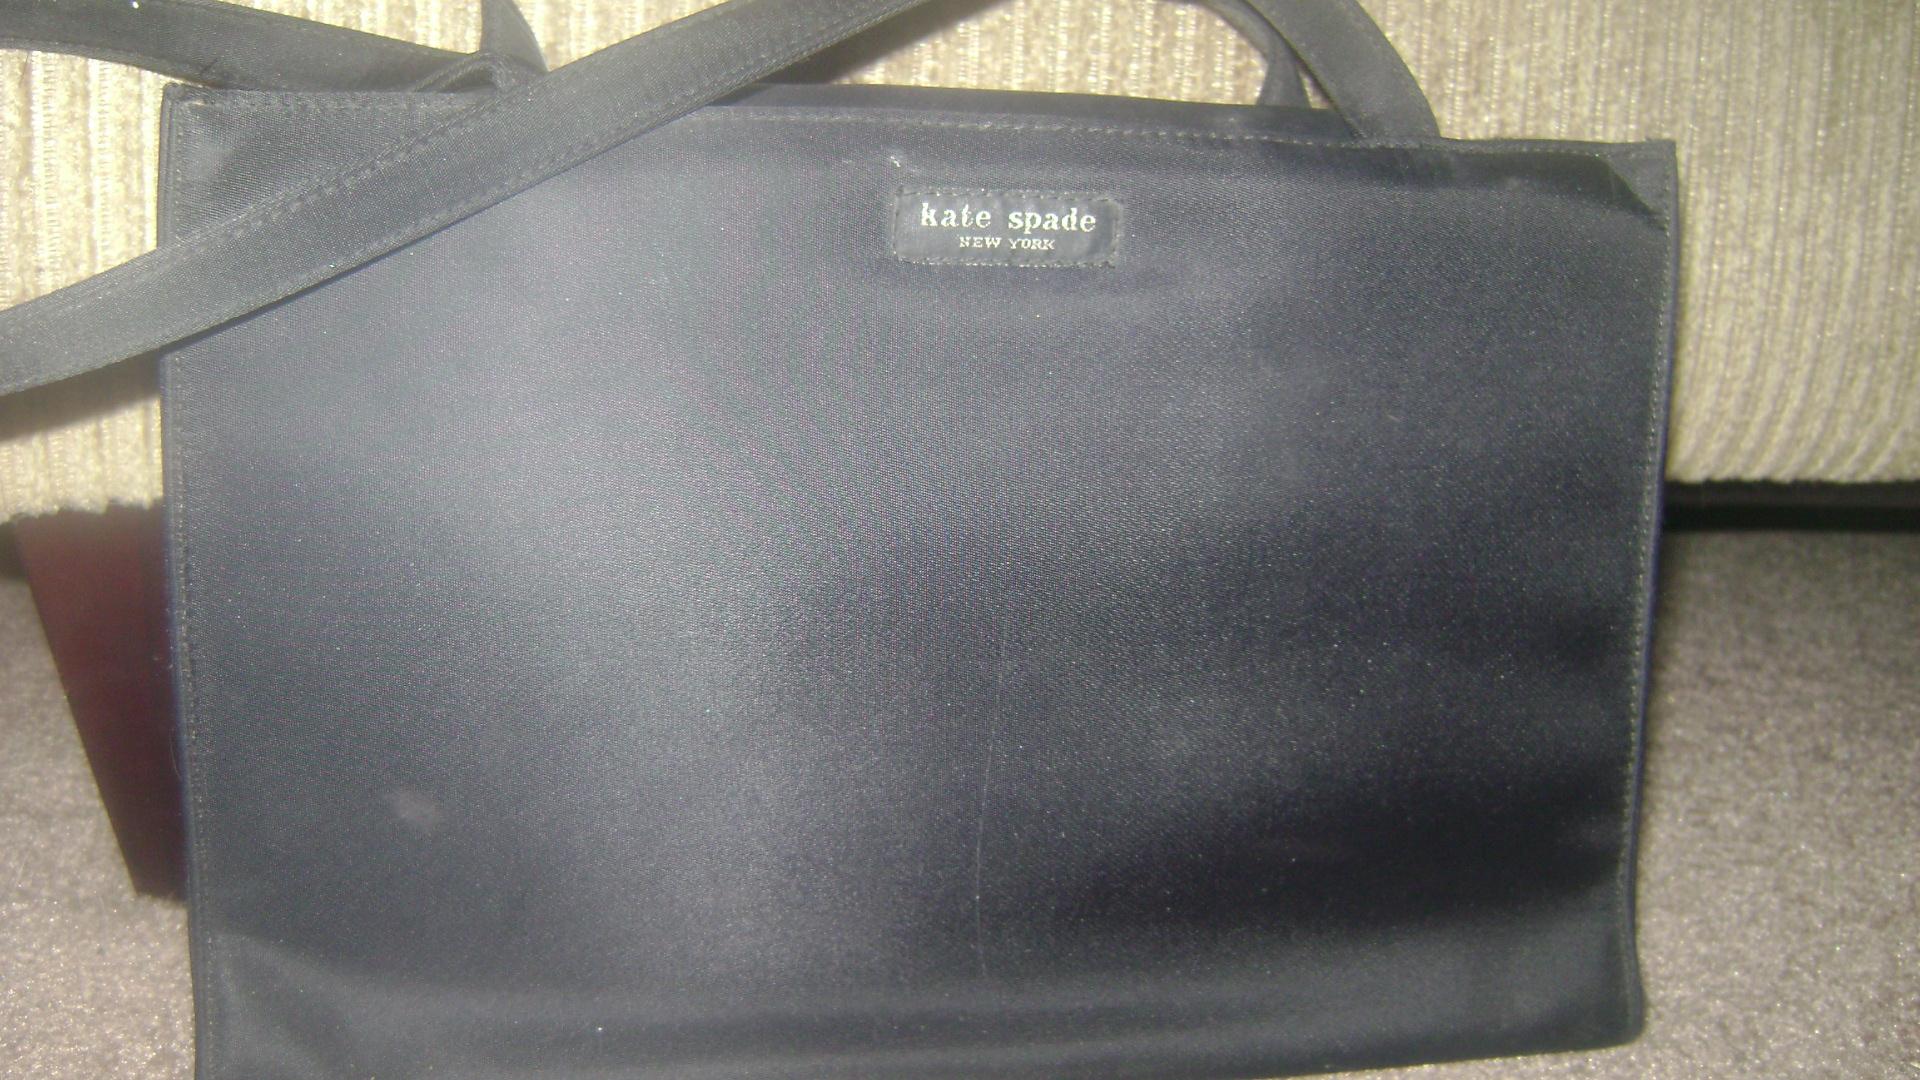 Kate Spade knock off handbag